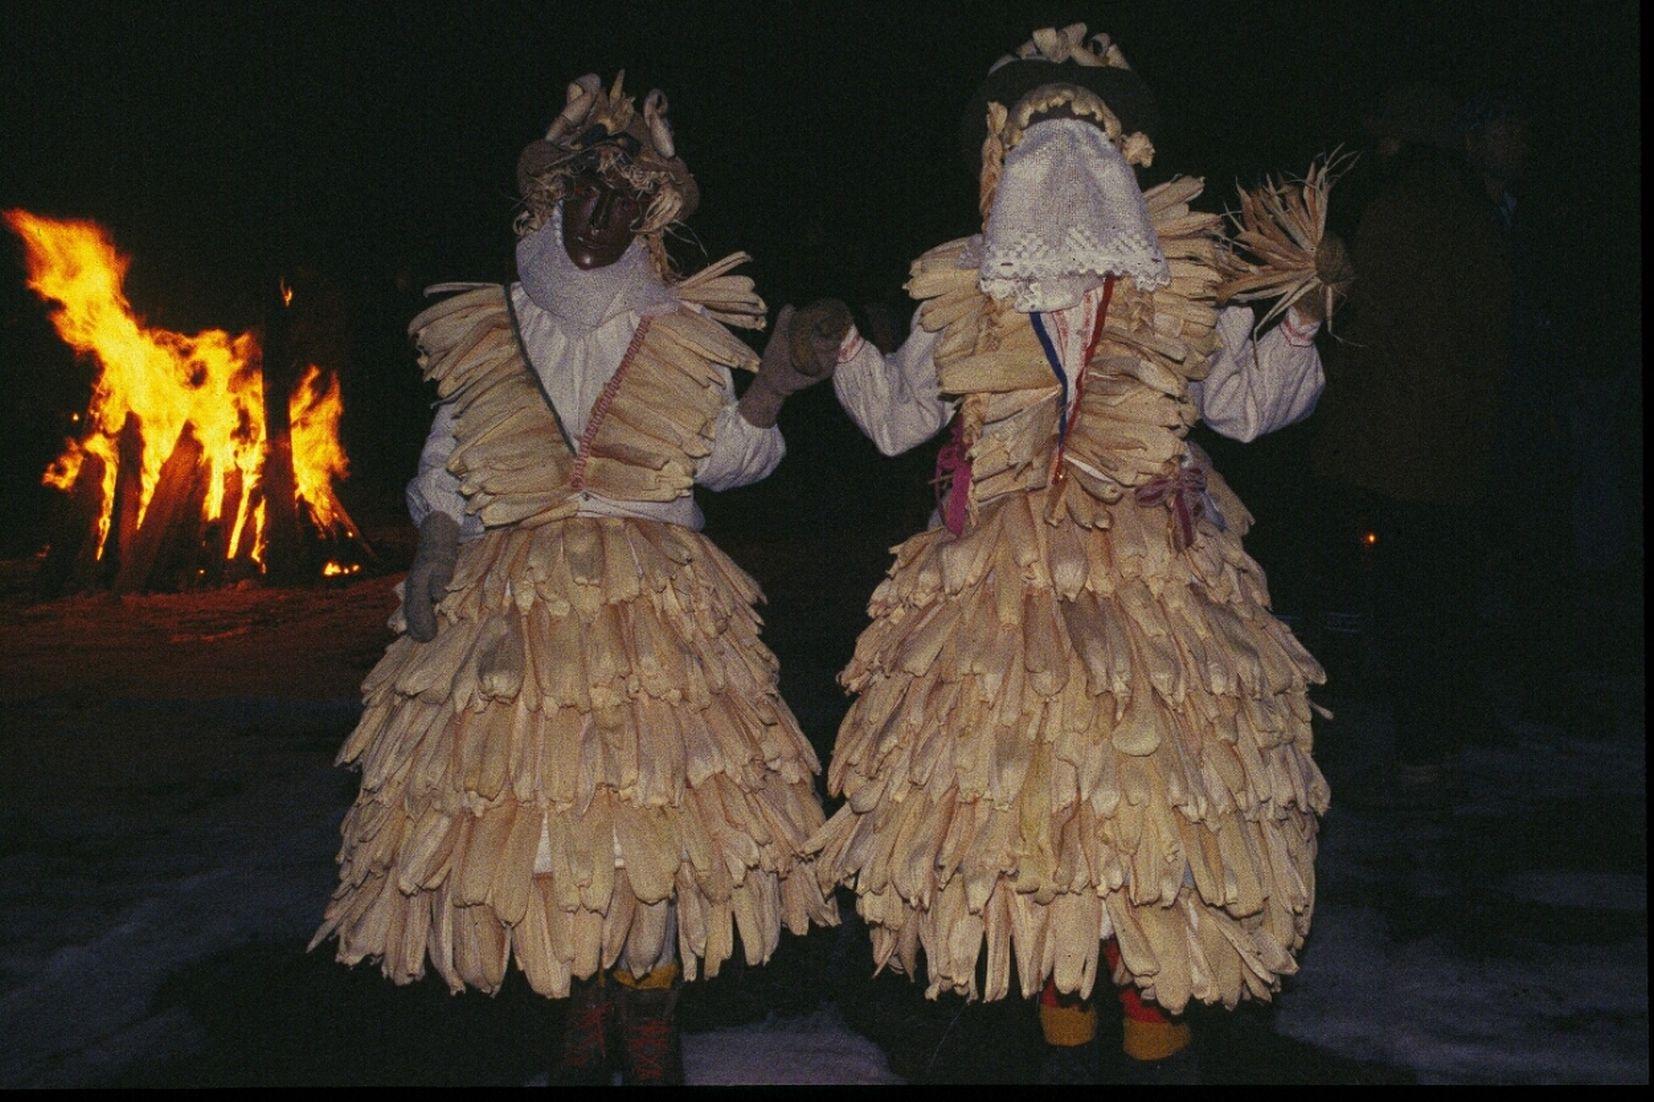 Programma Carnevale di Sauris 2015